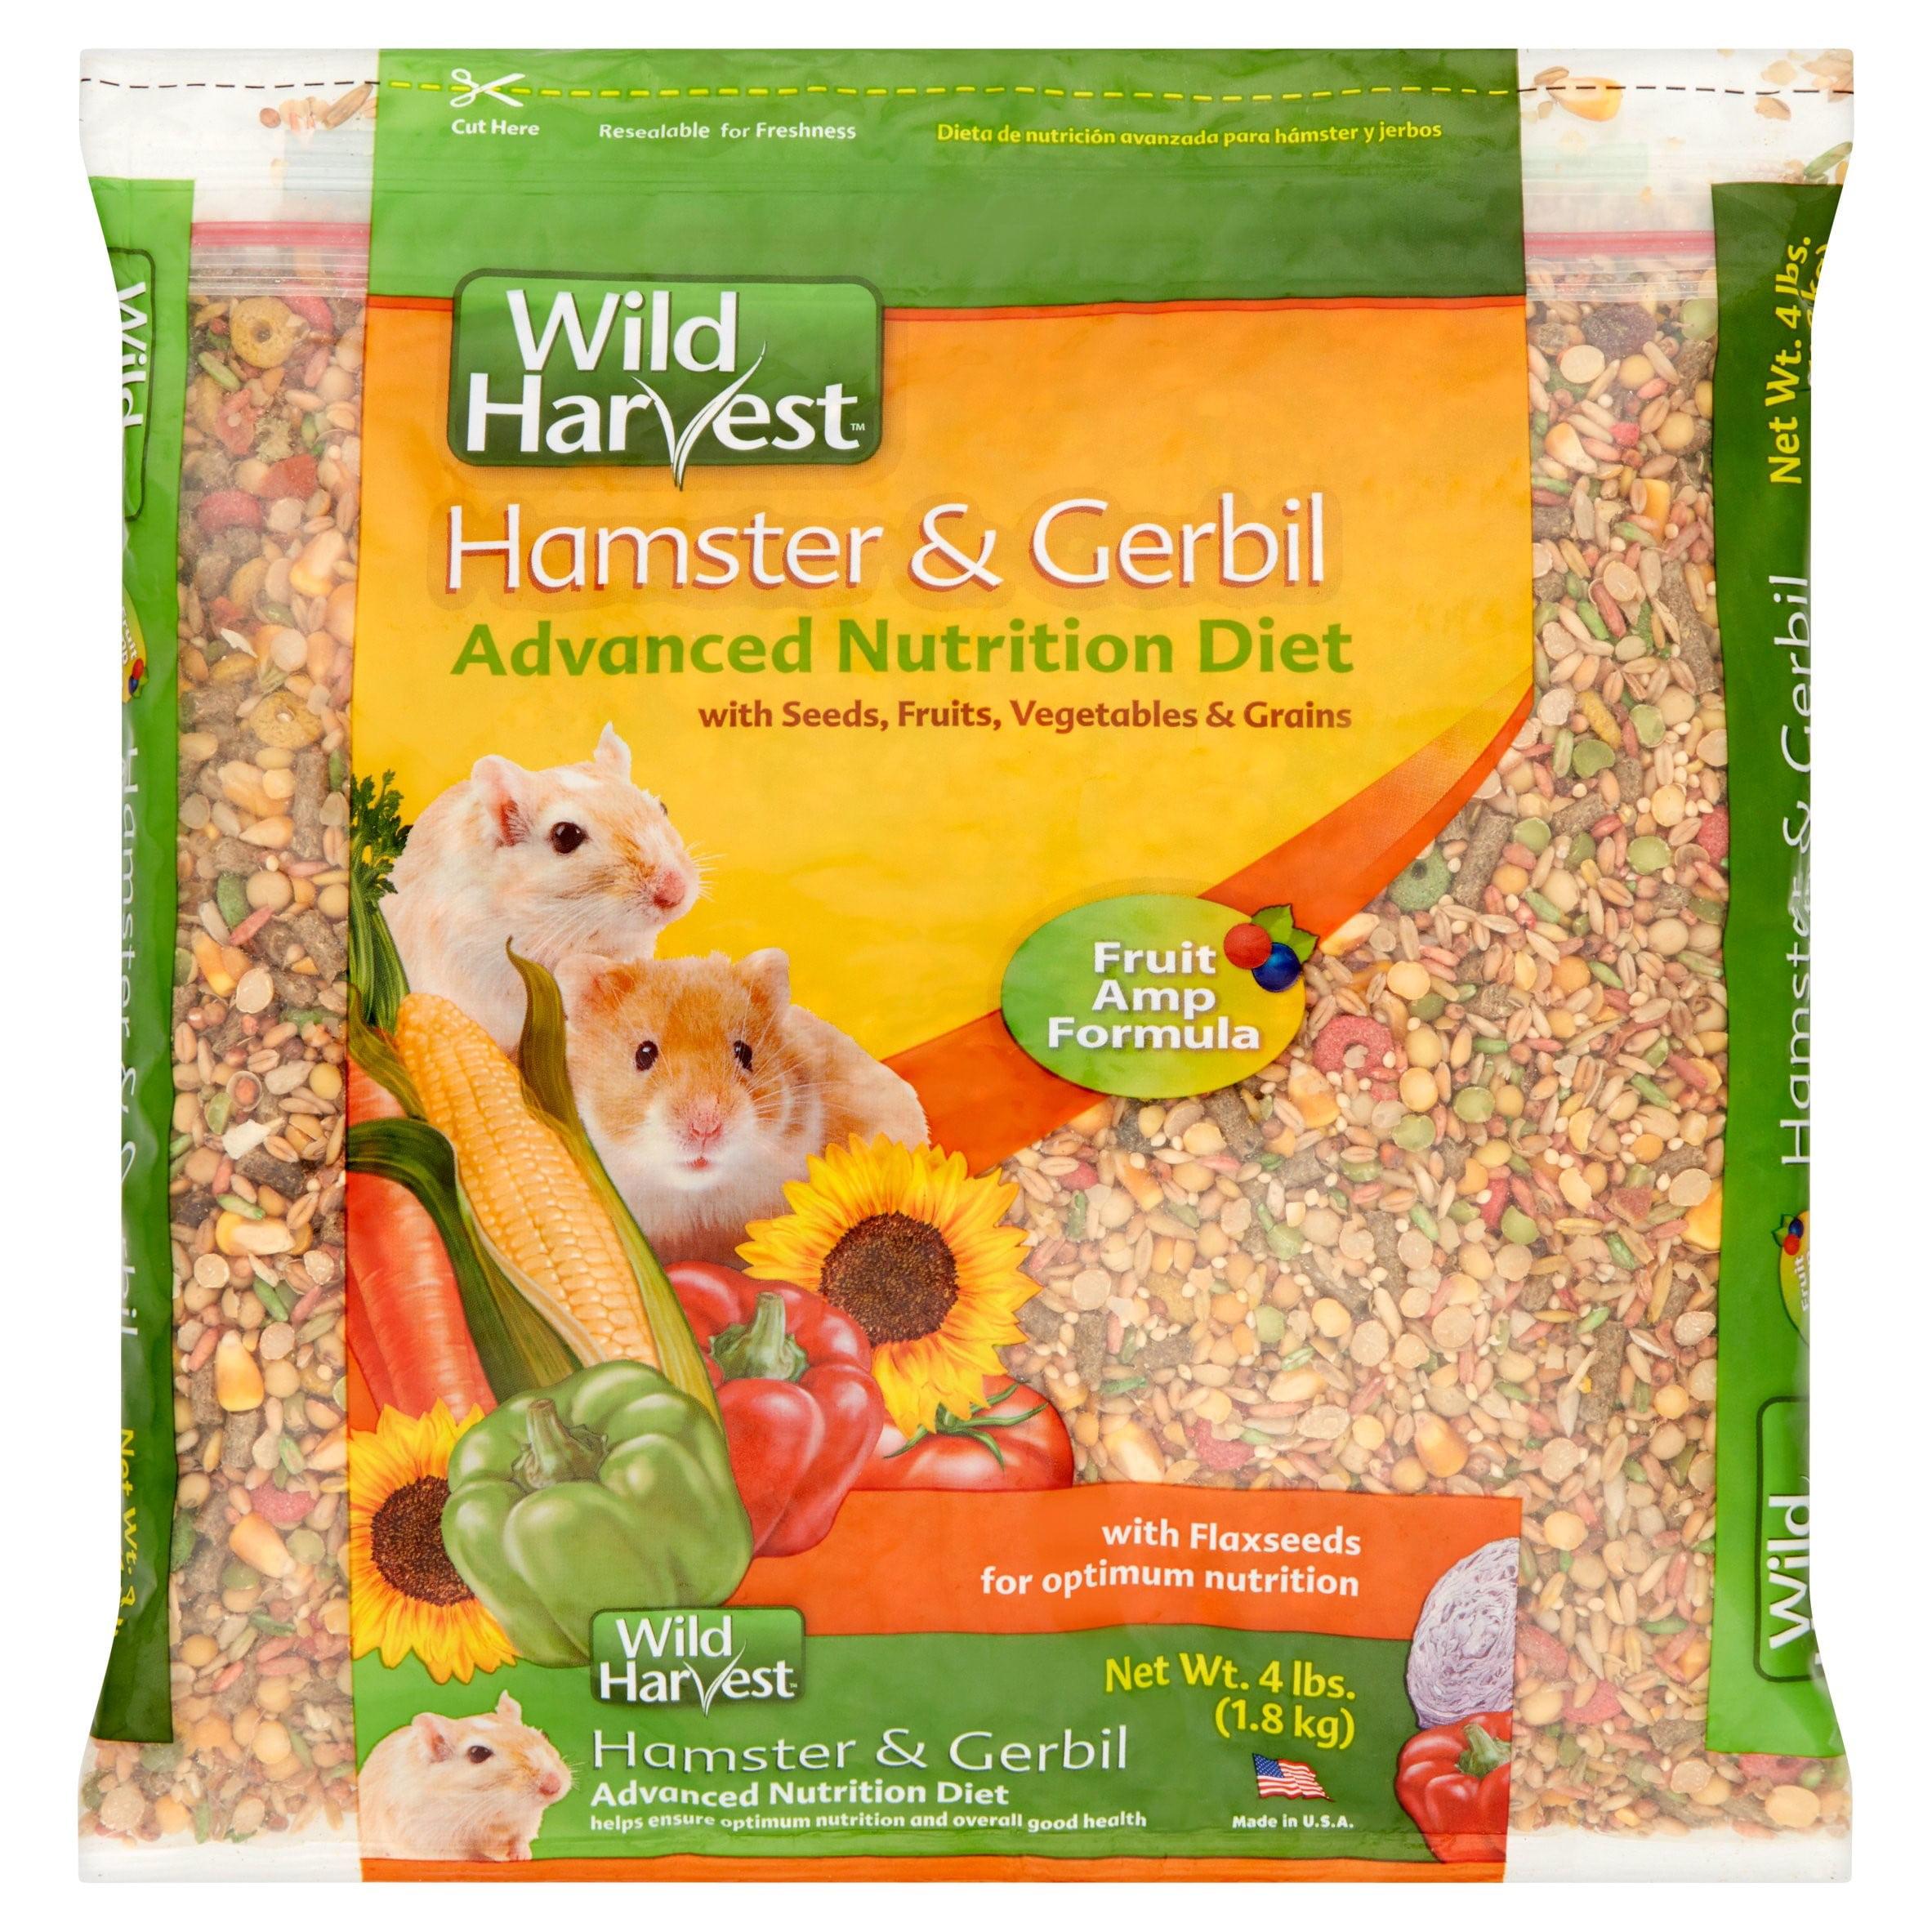 Wild Harvest Hamster and Gerbil Advanced Nutrition Diet, 4 lb by Spectrum Brands